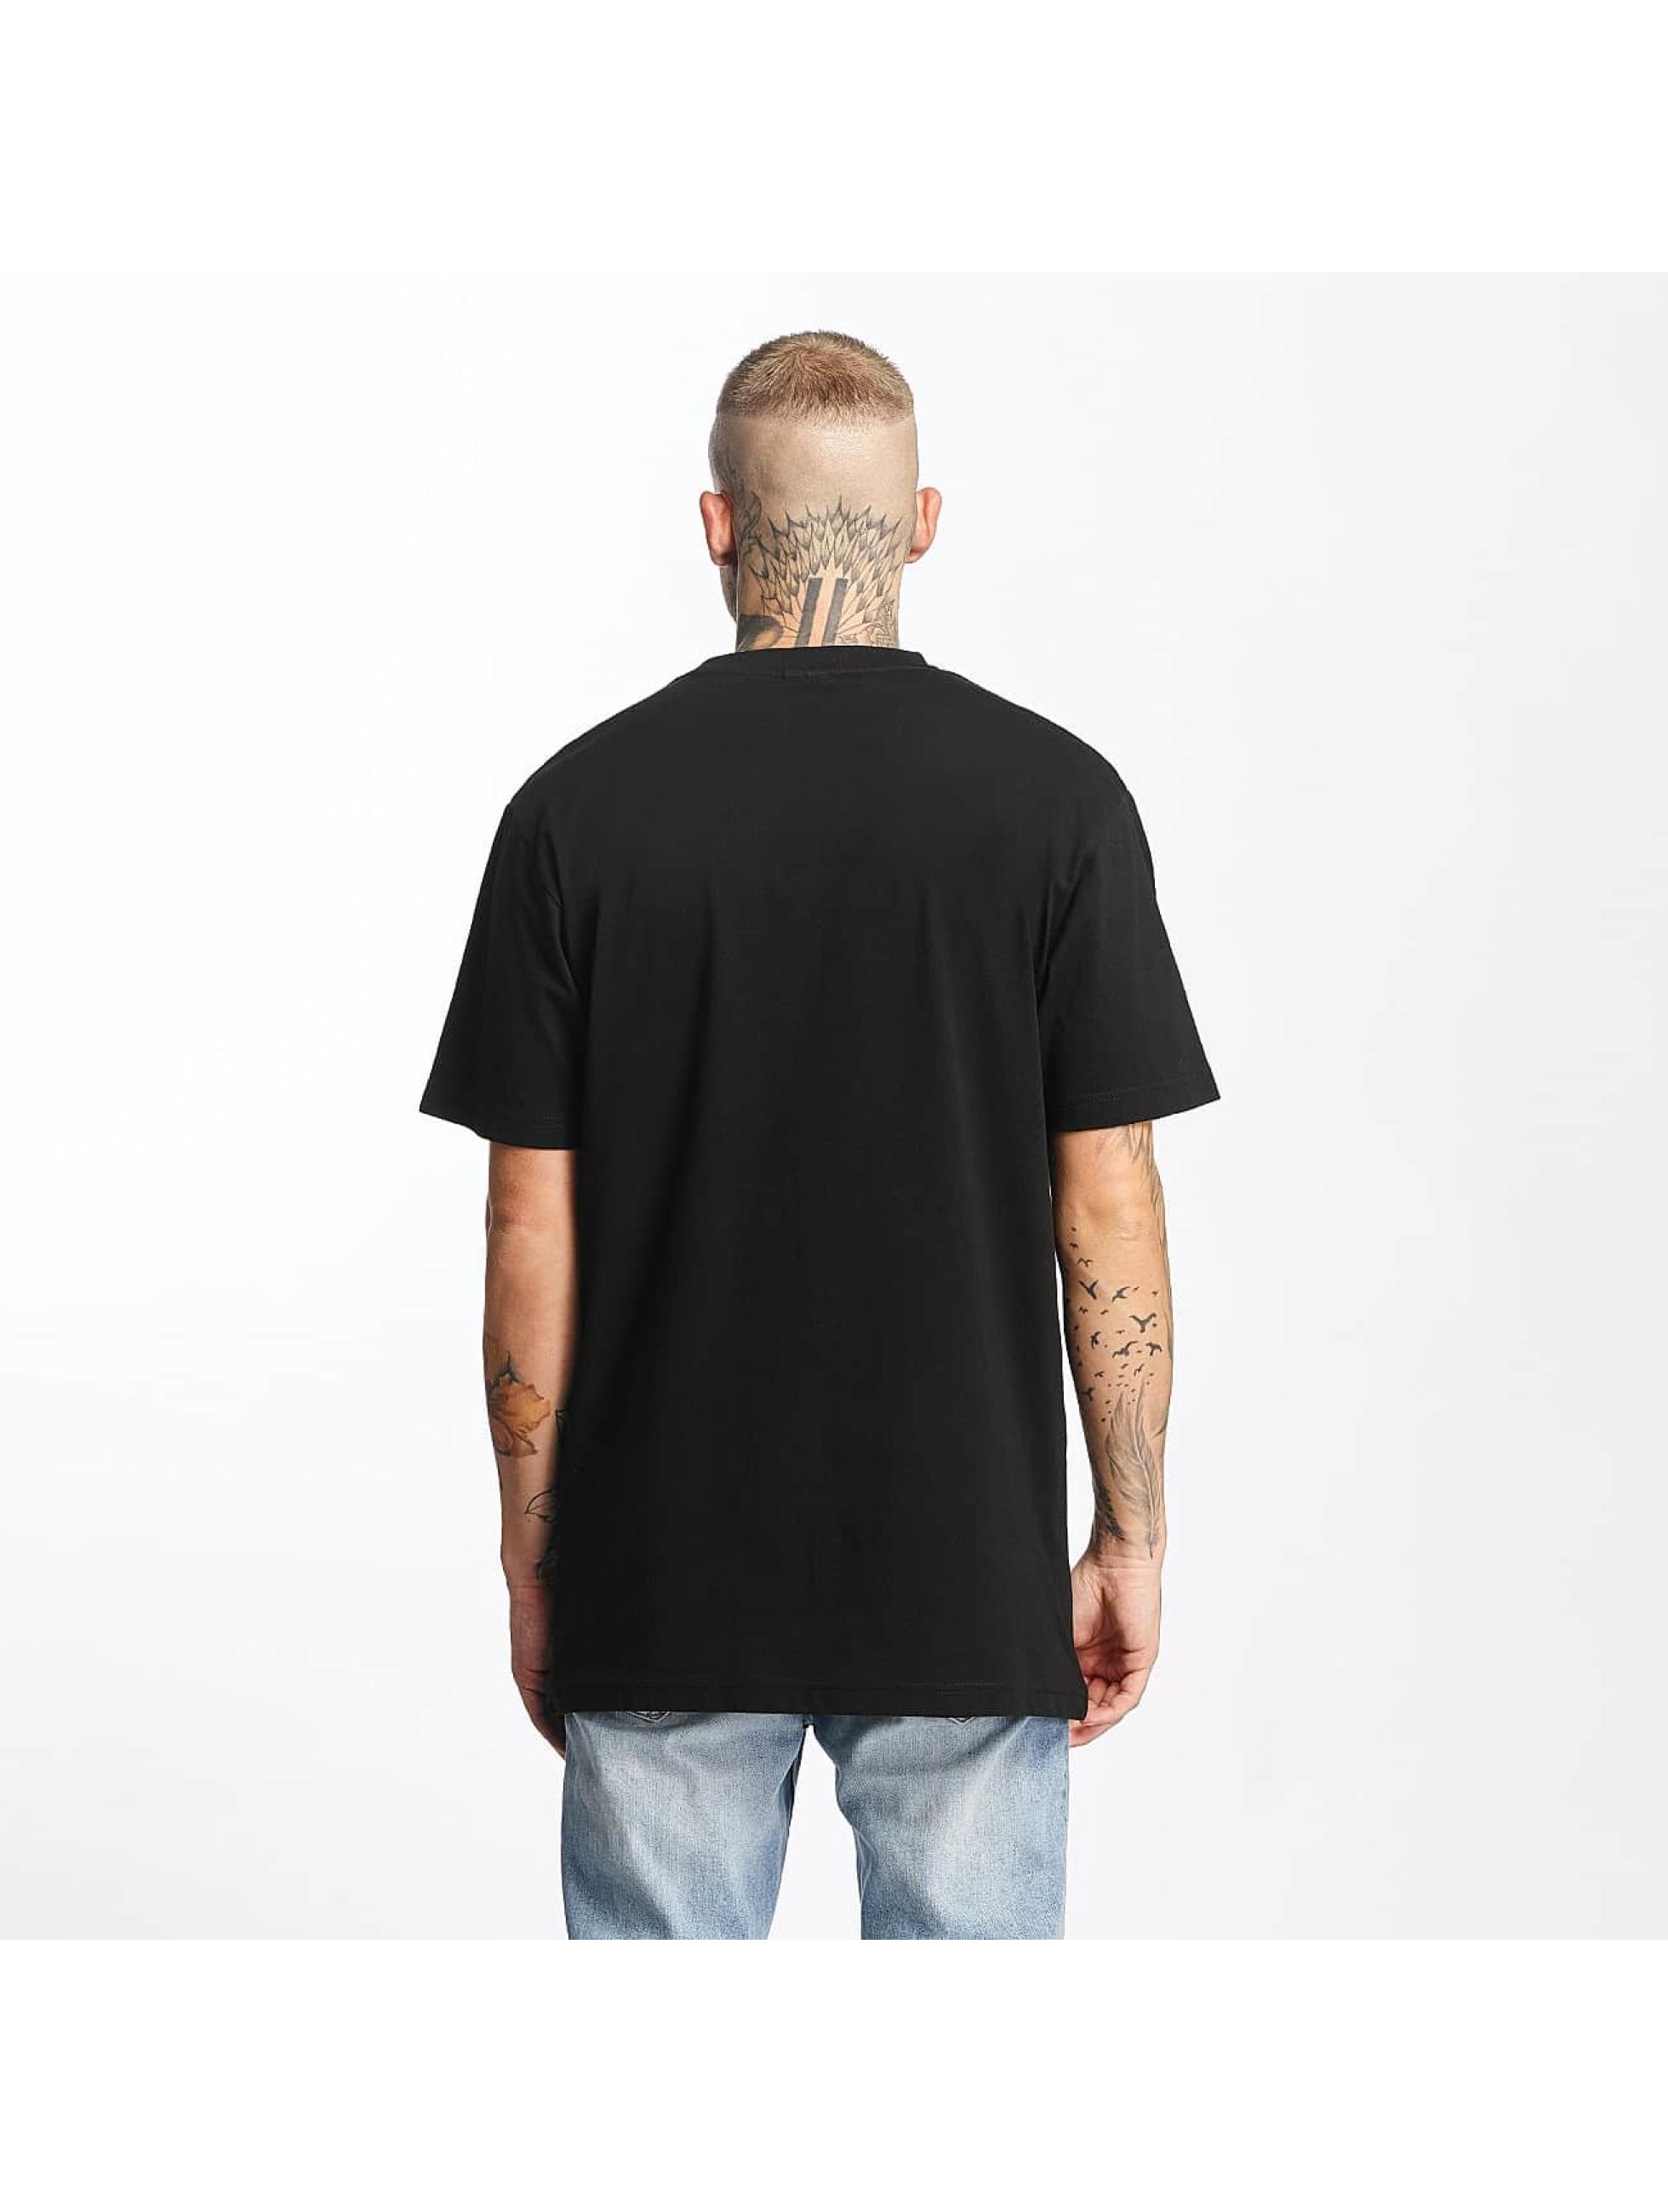 Mister Tee t-shirt Halo I Bims zwart